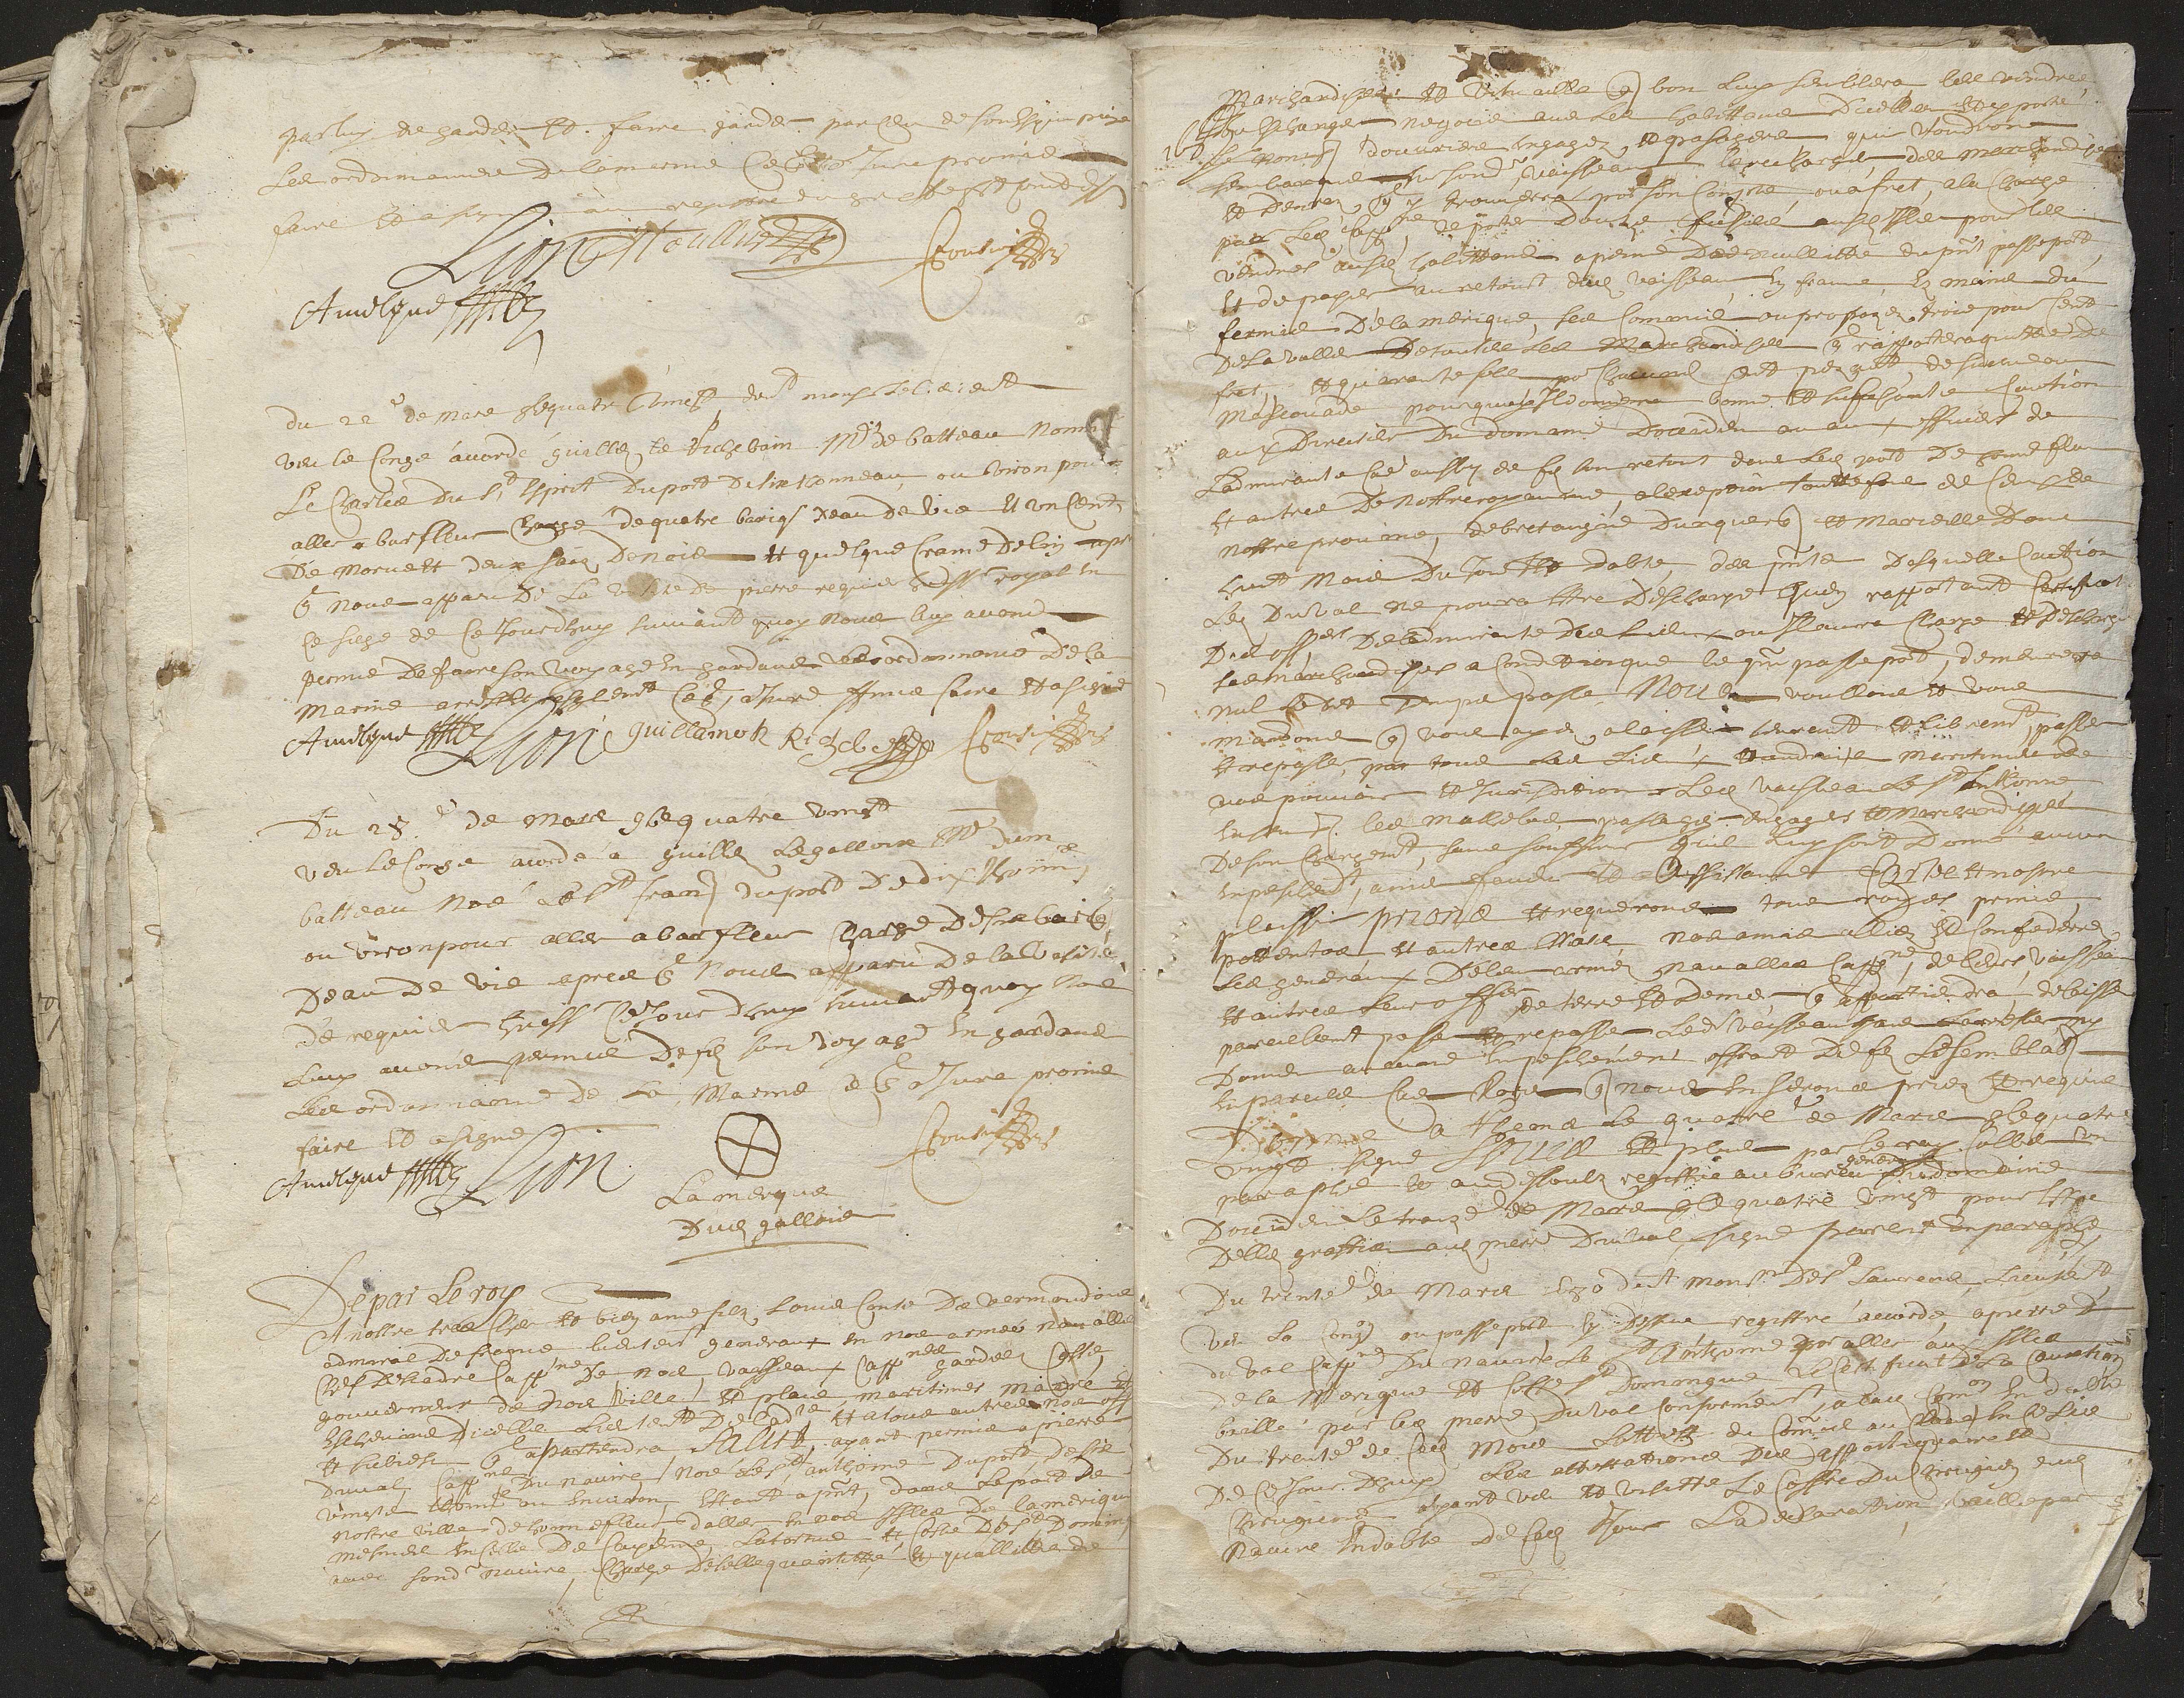 28 septembre 1679-26 avril 1680